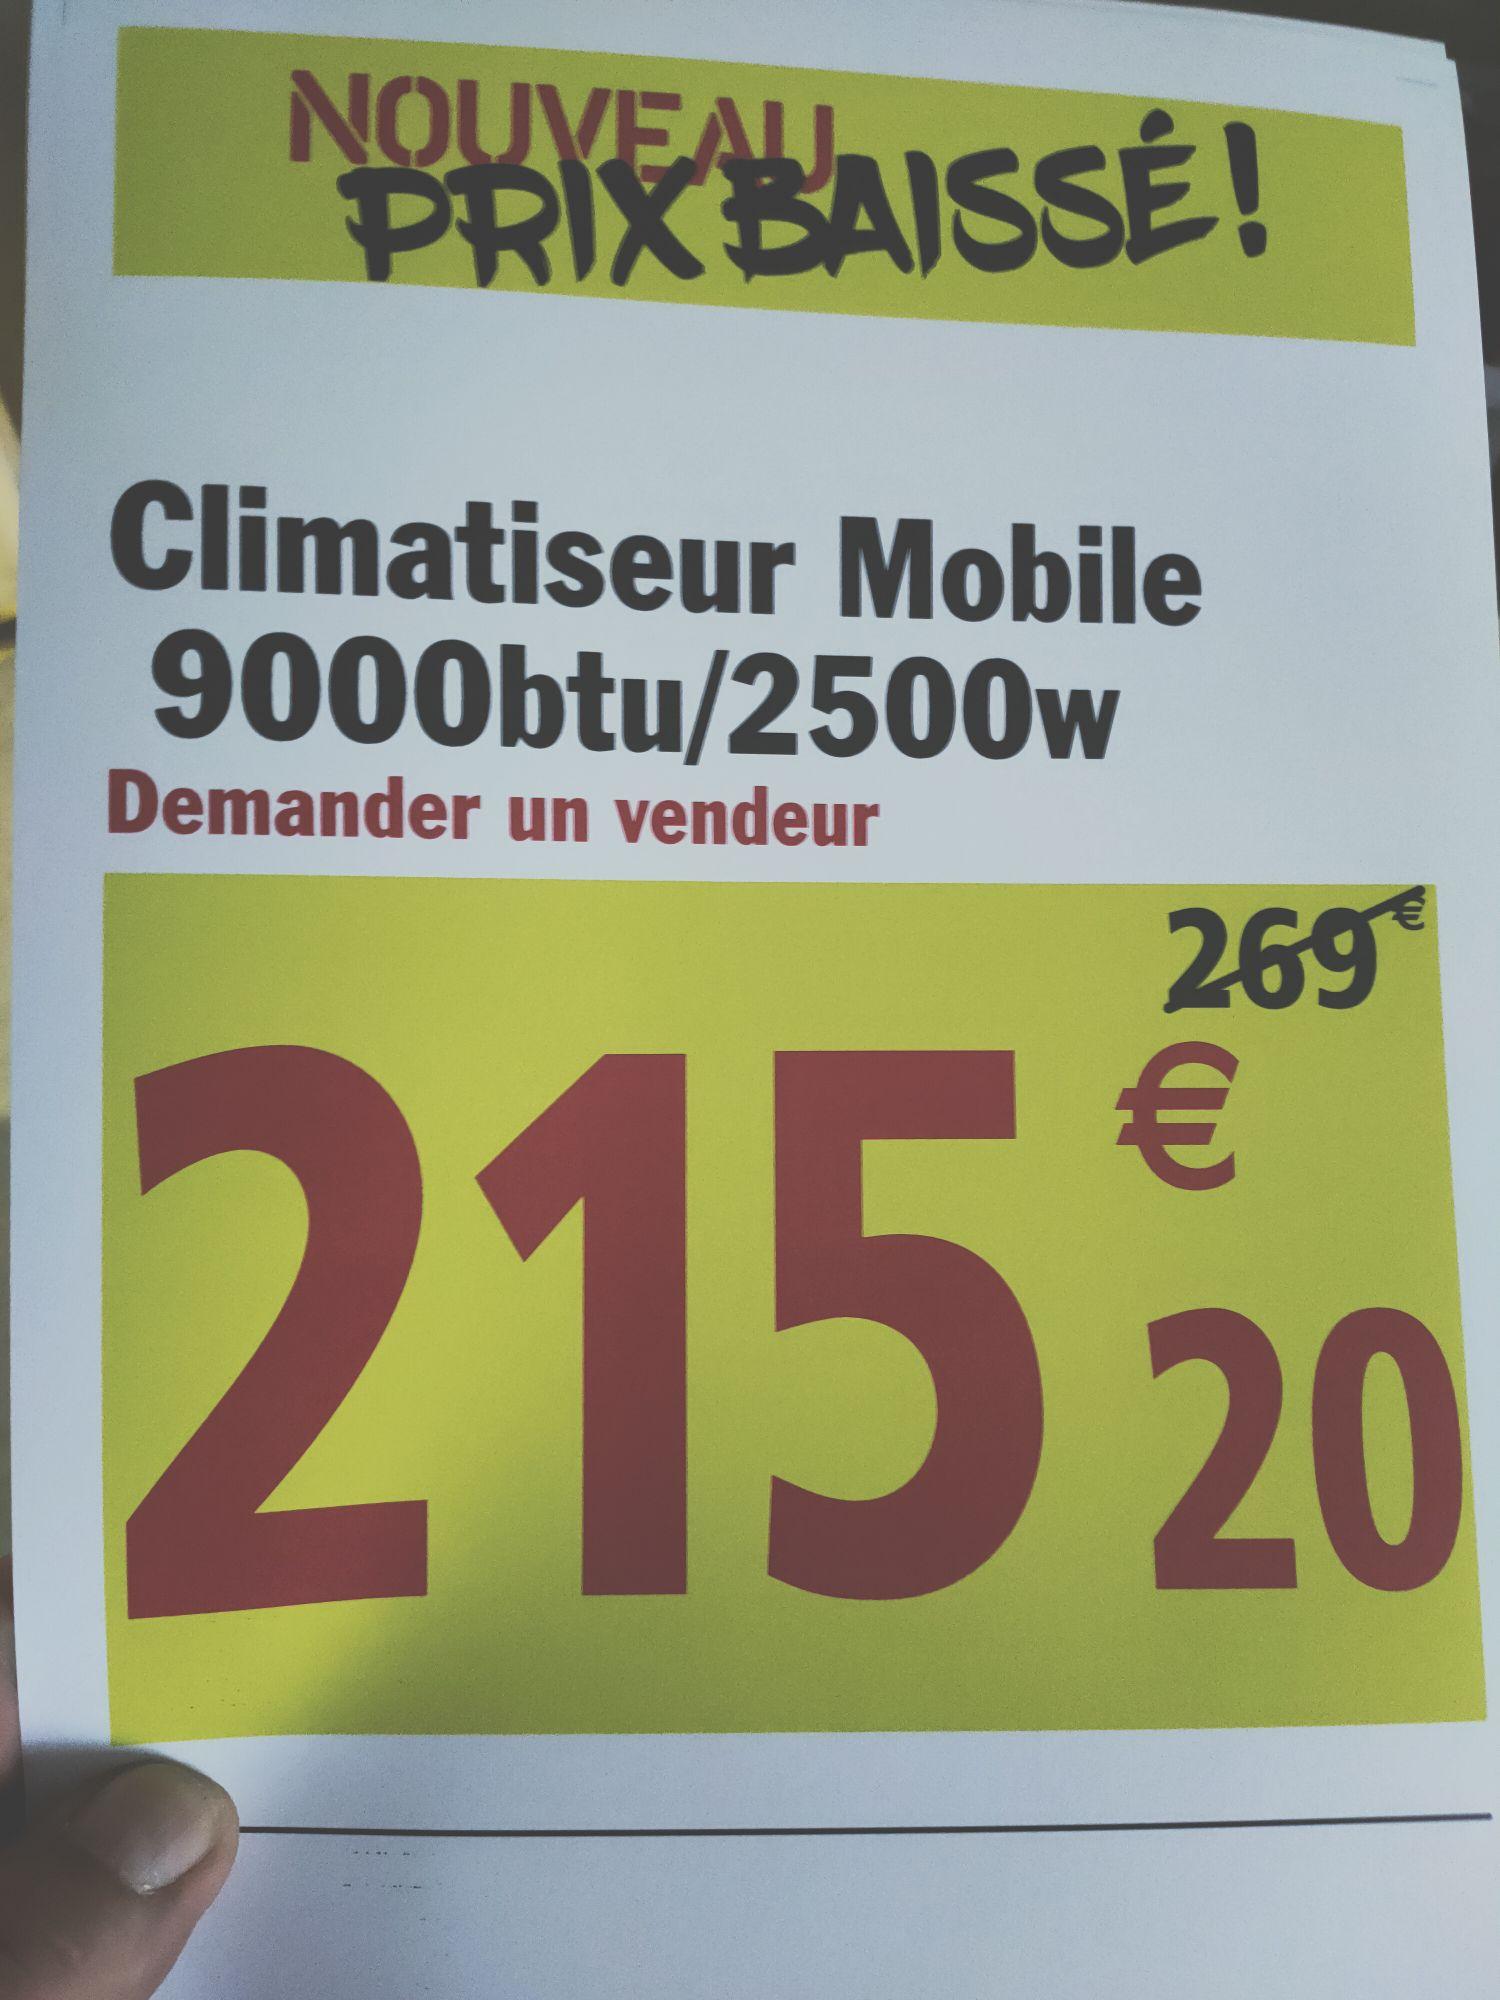 Climatiseur mobile GoodHome - 9000btu/2500w (Reims 51)